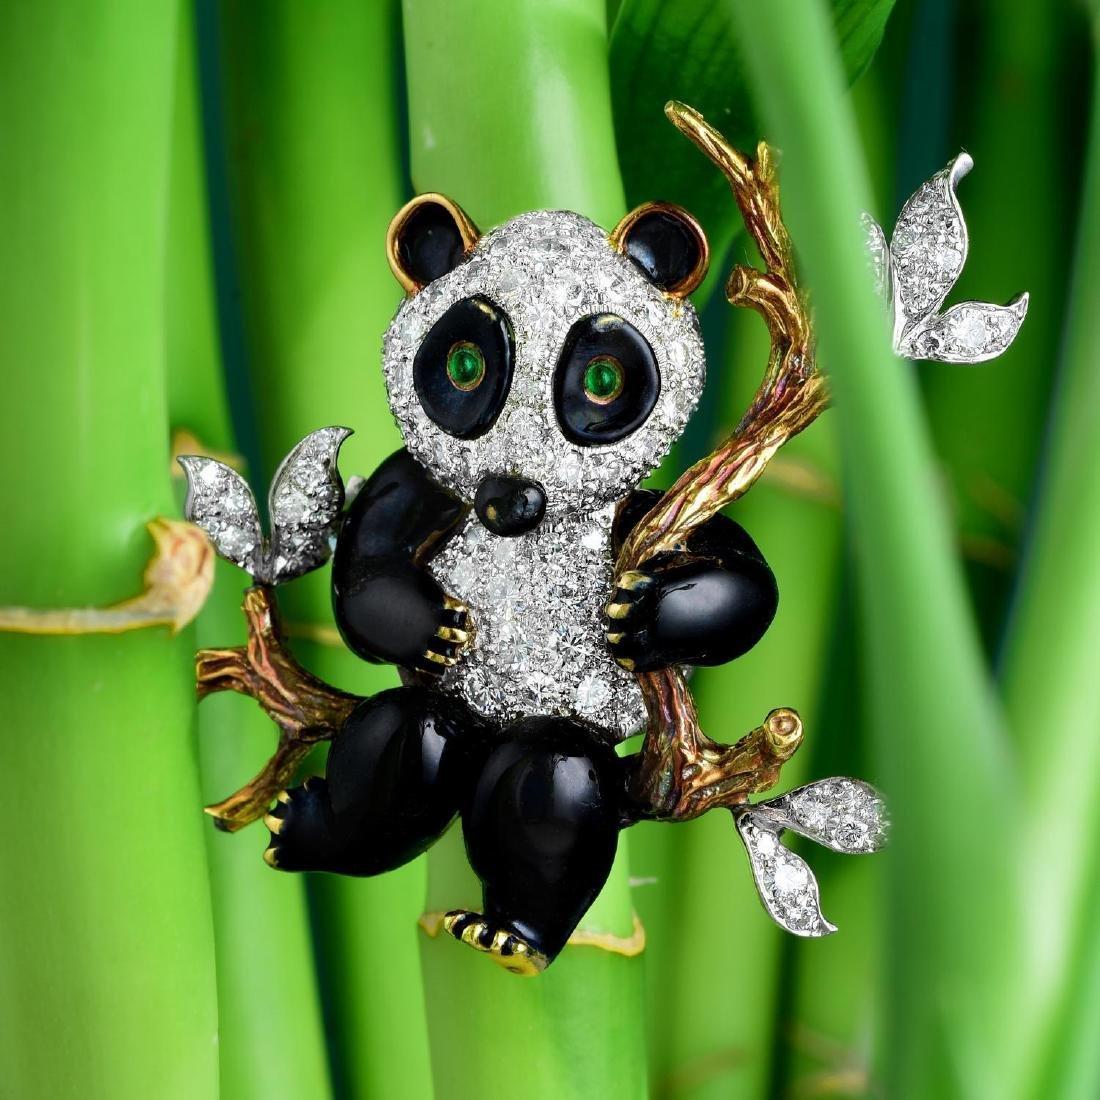 Donald Claflin Tiffany & Co Enamel Diamond Panda Brooch